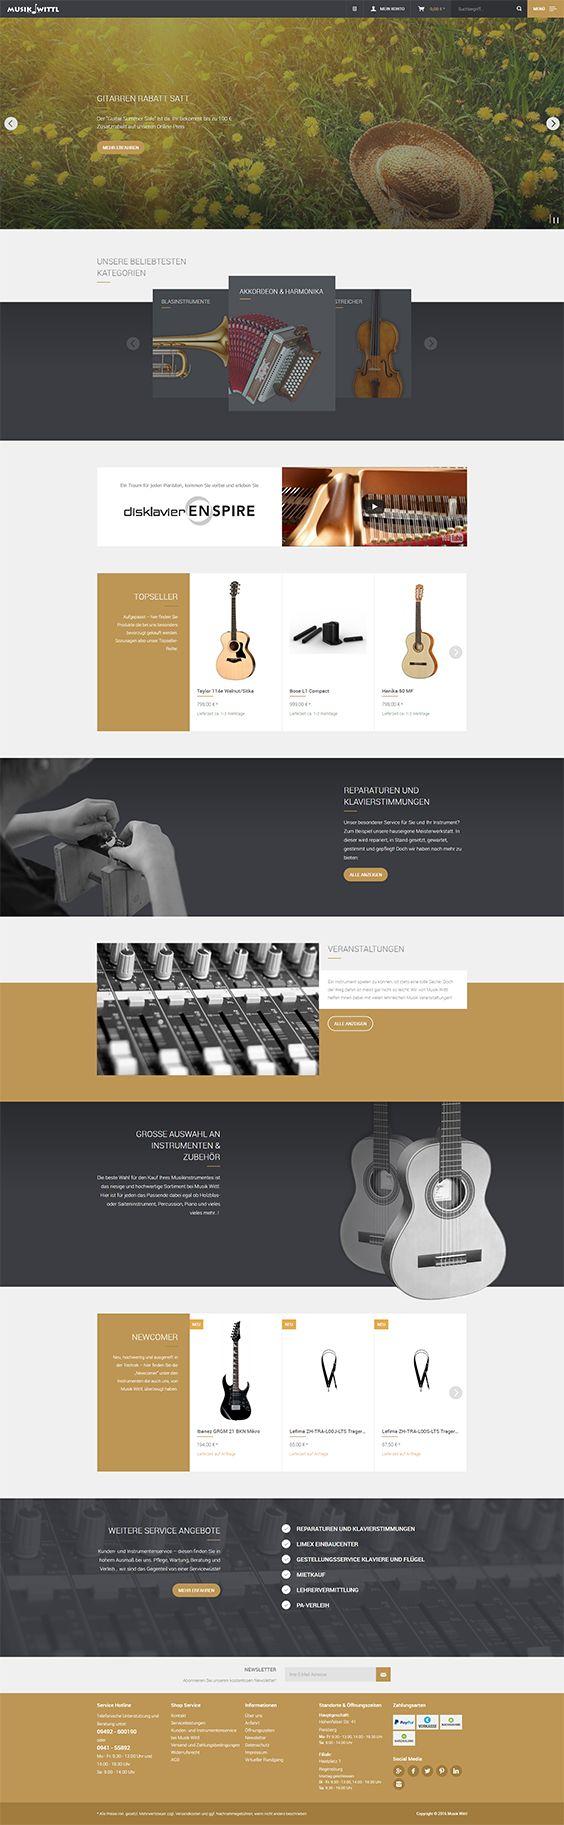 Shopware Design, Shopware Theme, Shopware Shop, eCommerce, eCommerce Software, eCommerce platform, Onlineshop, music instruments, hobby, music, guitars, trompets, pianos, saxophones, wind instruments